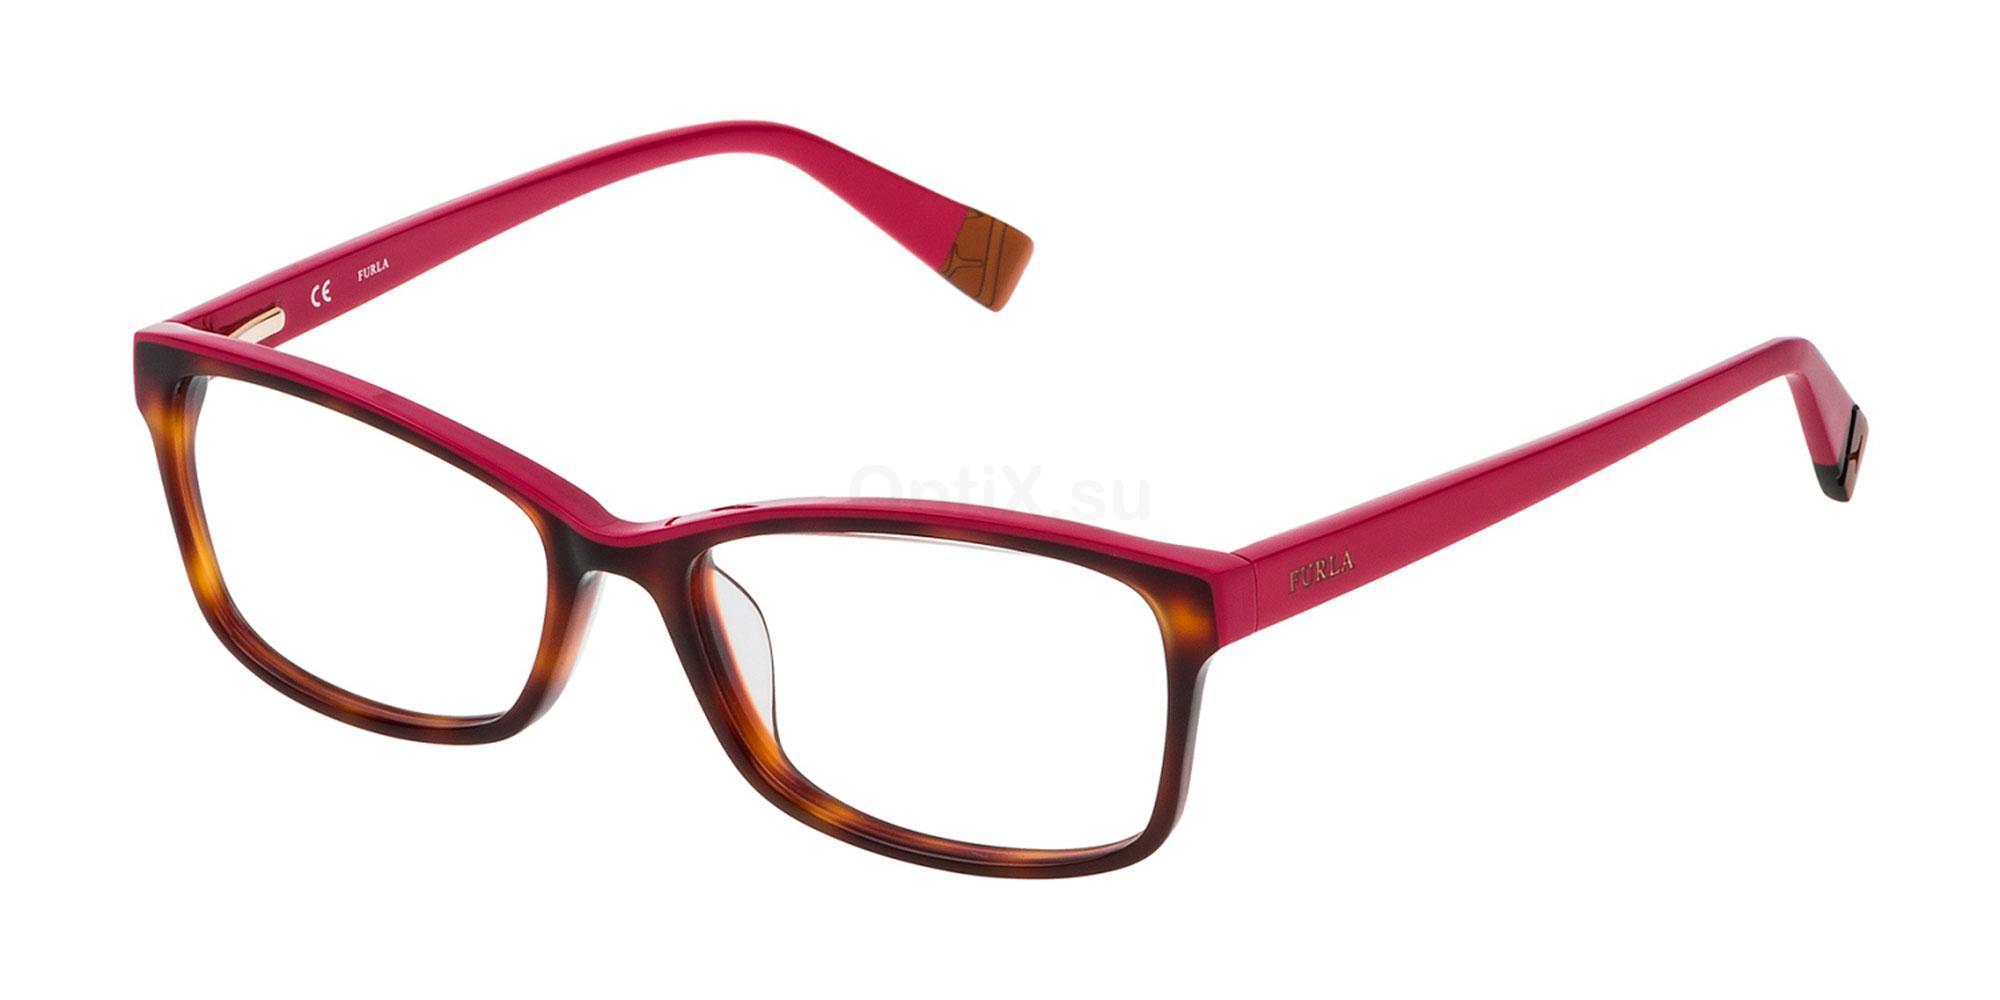 0897 VFU094 Glasses, Furla